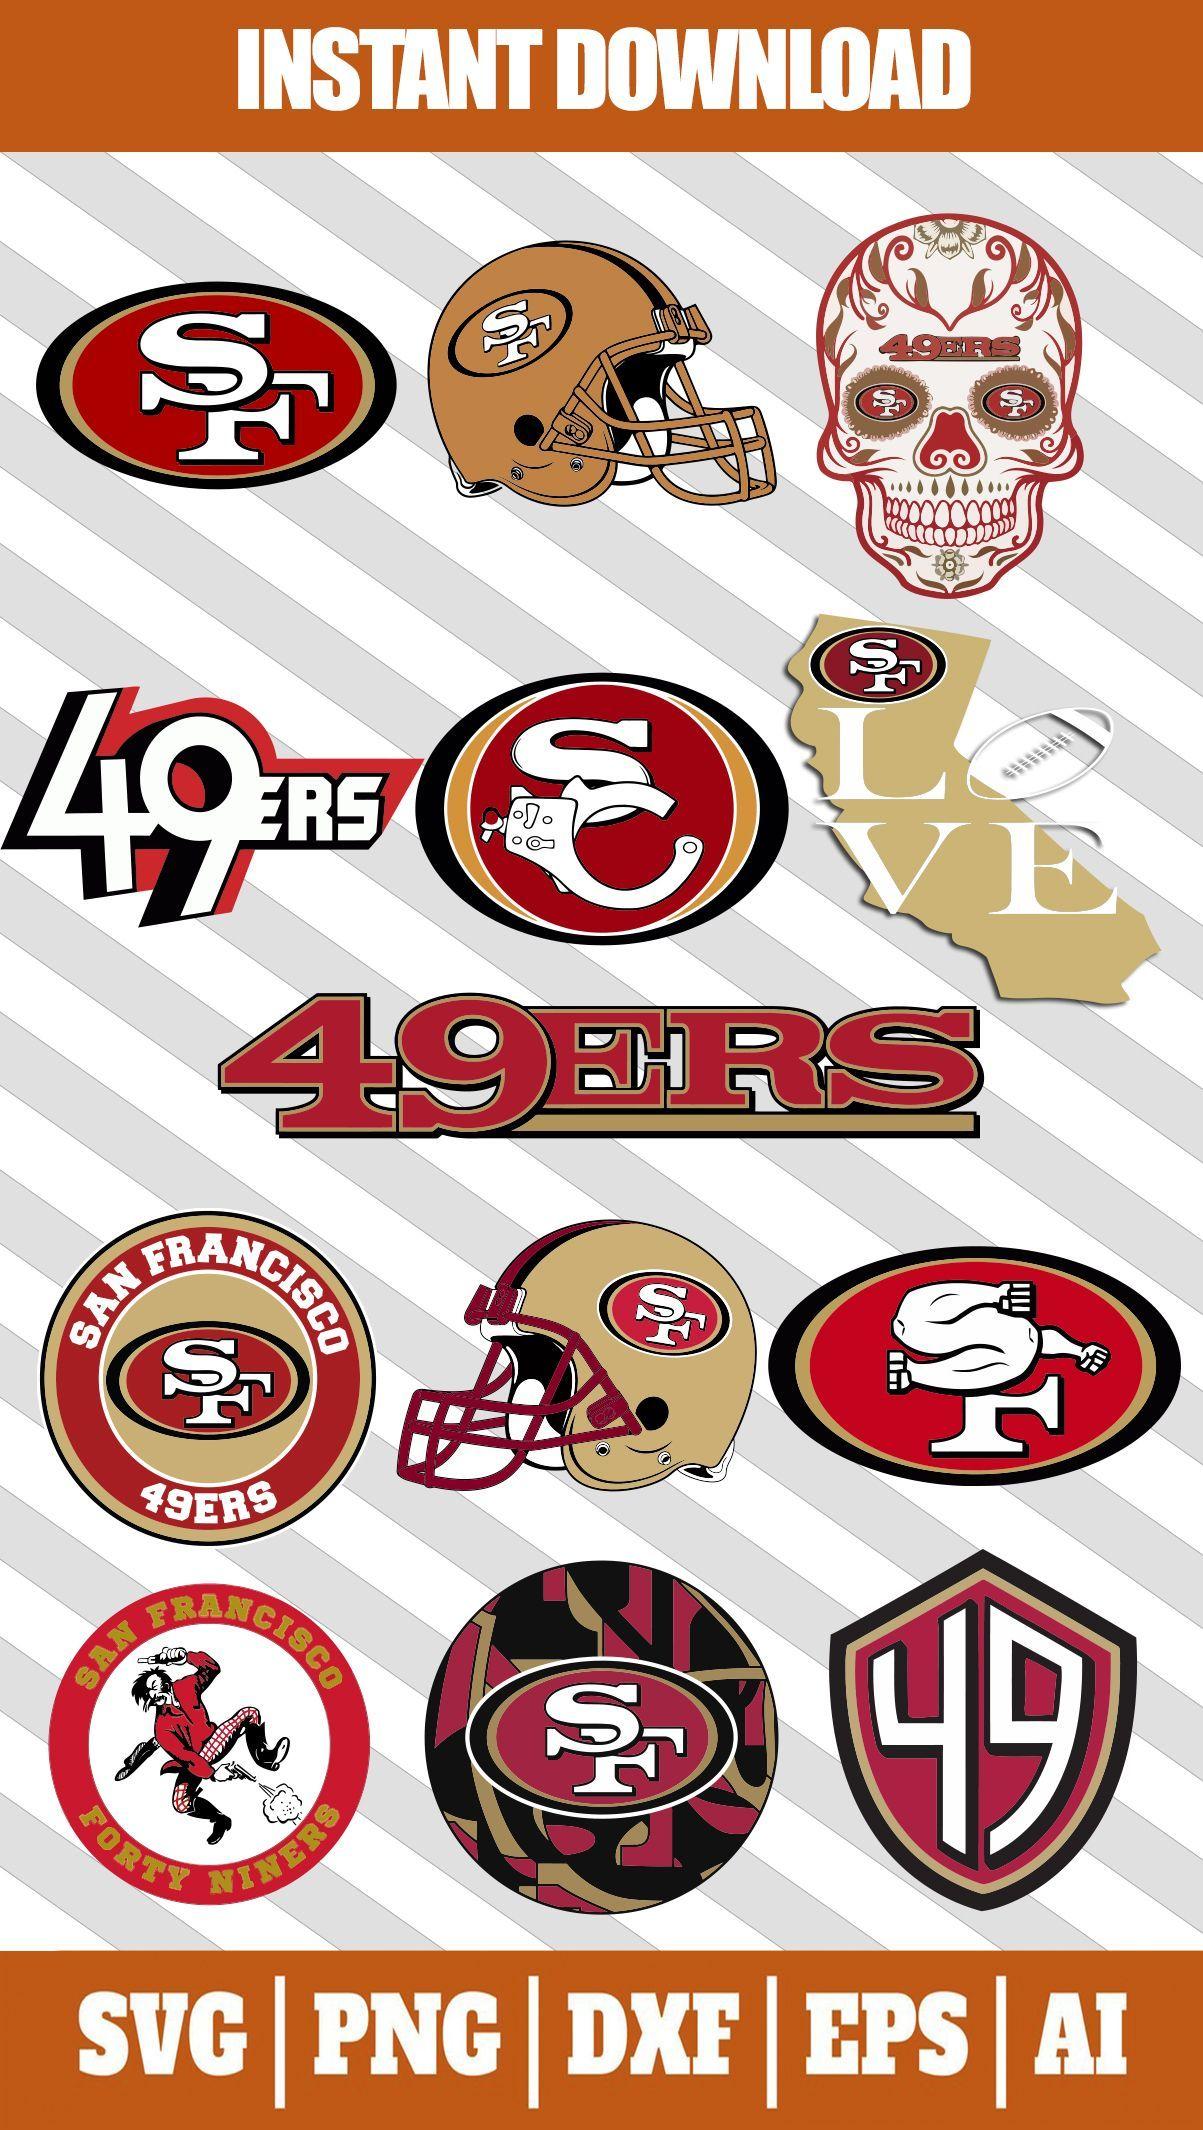 San Francisco 49ers Svg Free : francisco, 49ers, Snowboarding, #francisco, #49ers, Francisco, Free,, Shirts, Logo,, 49ers,